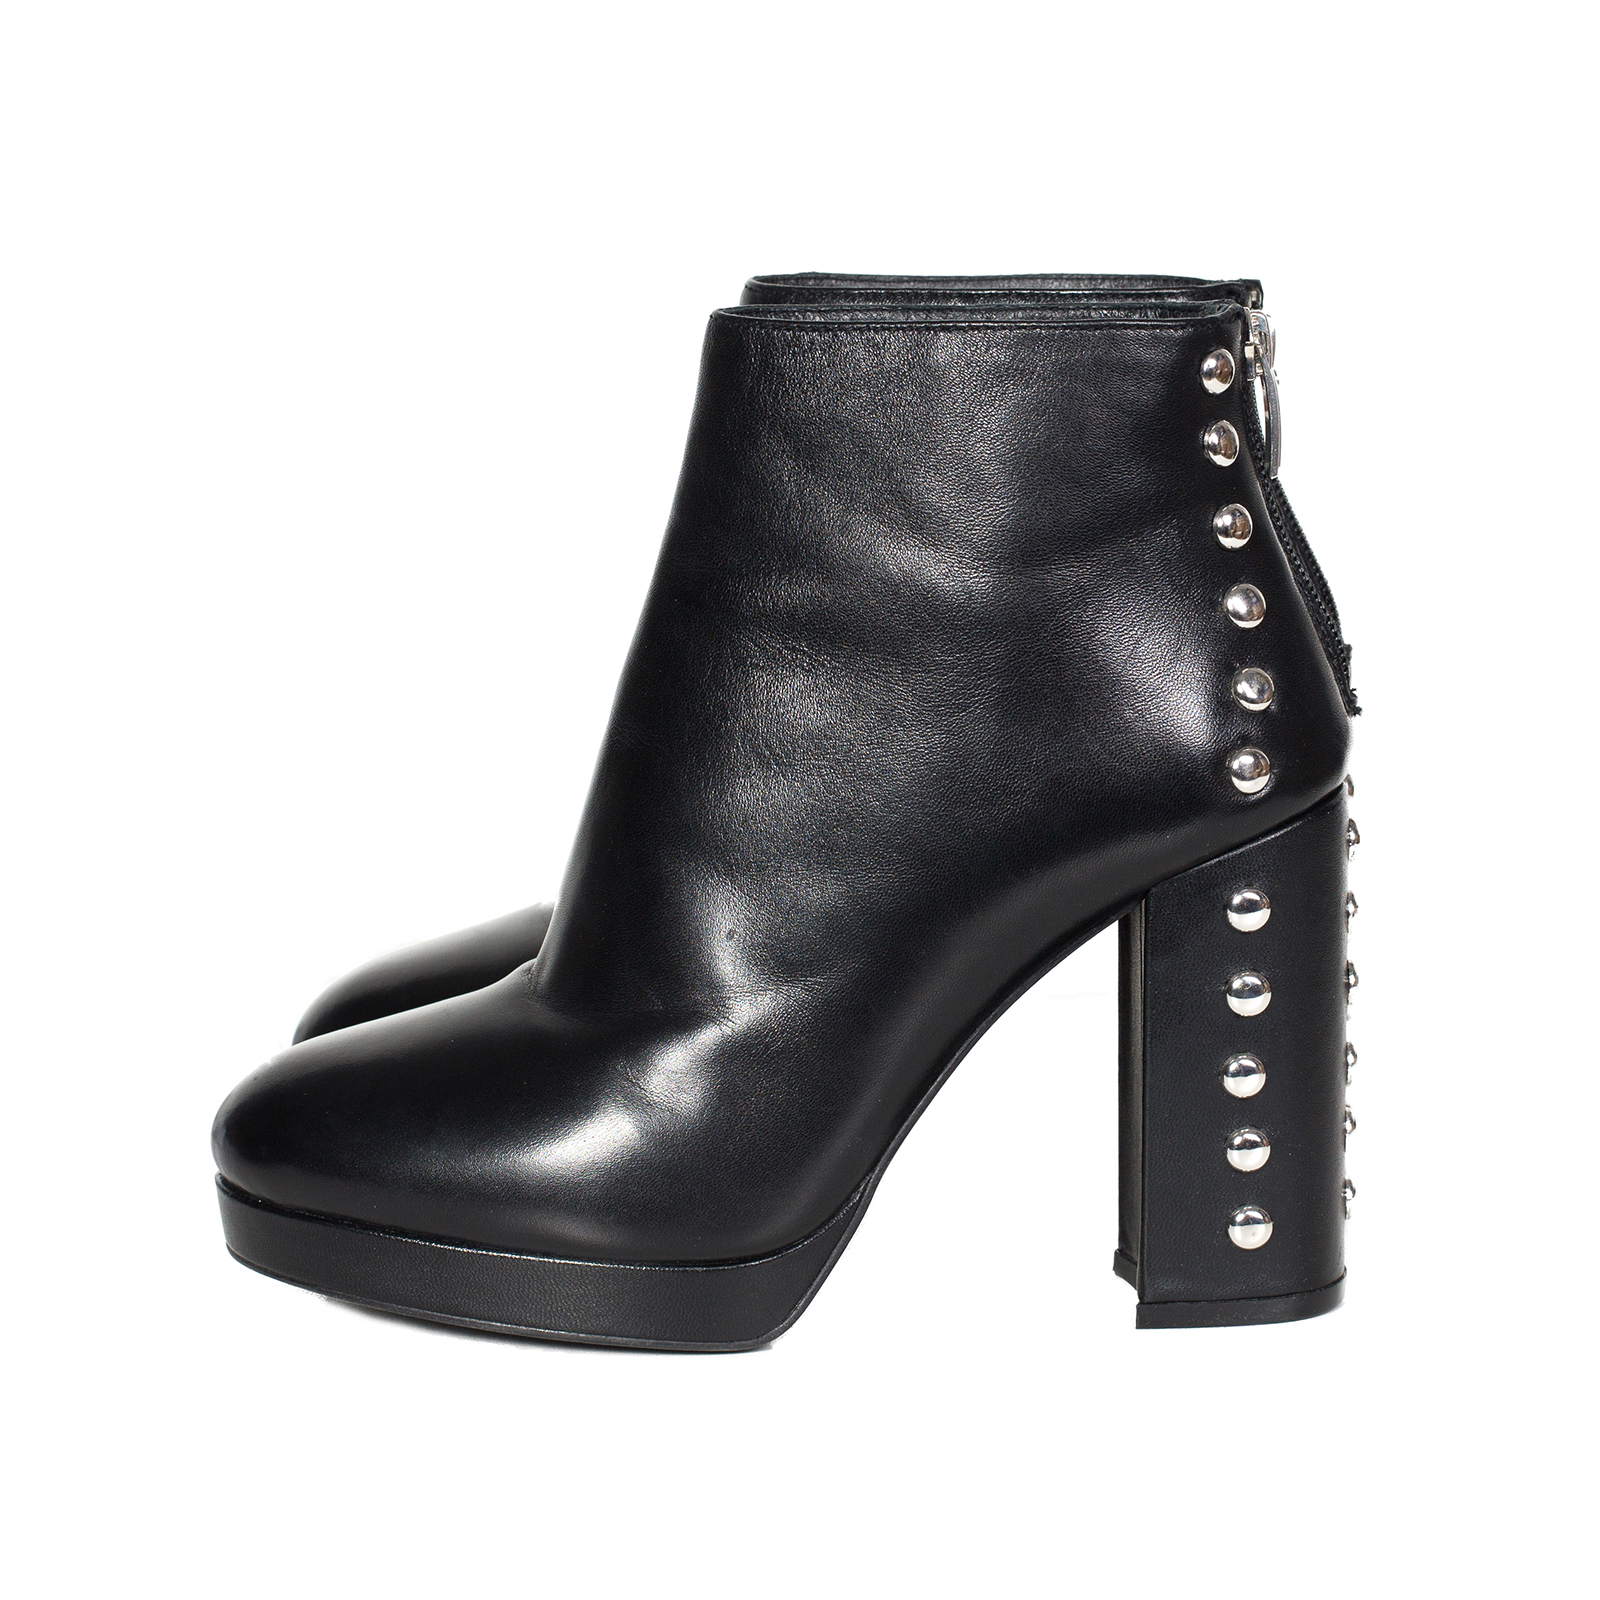 Ботинки, Ballerina, Charlotte FUR (черный)